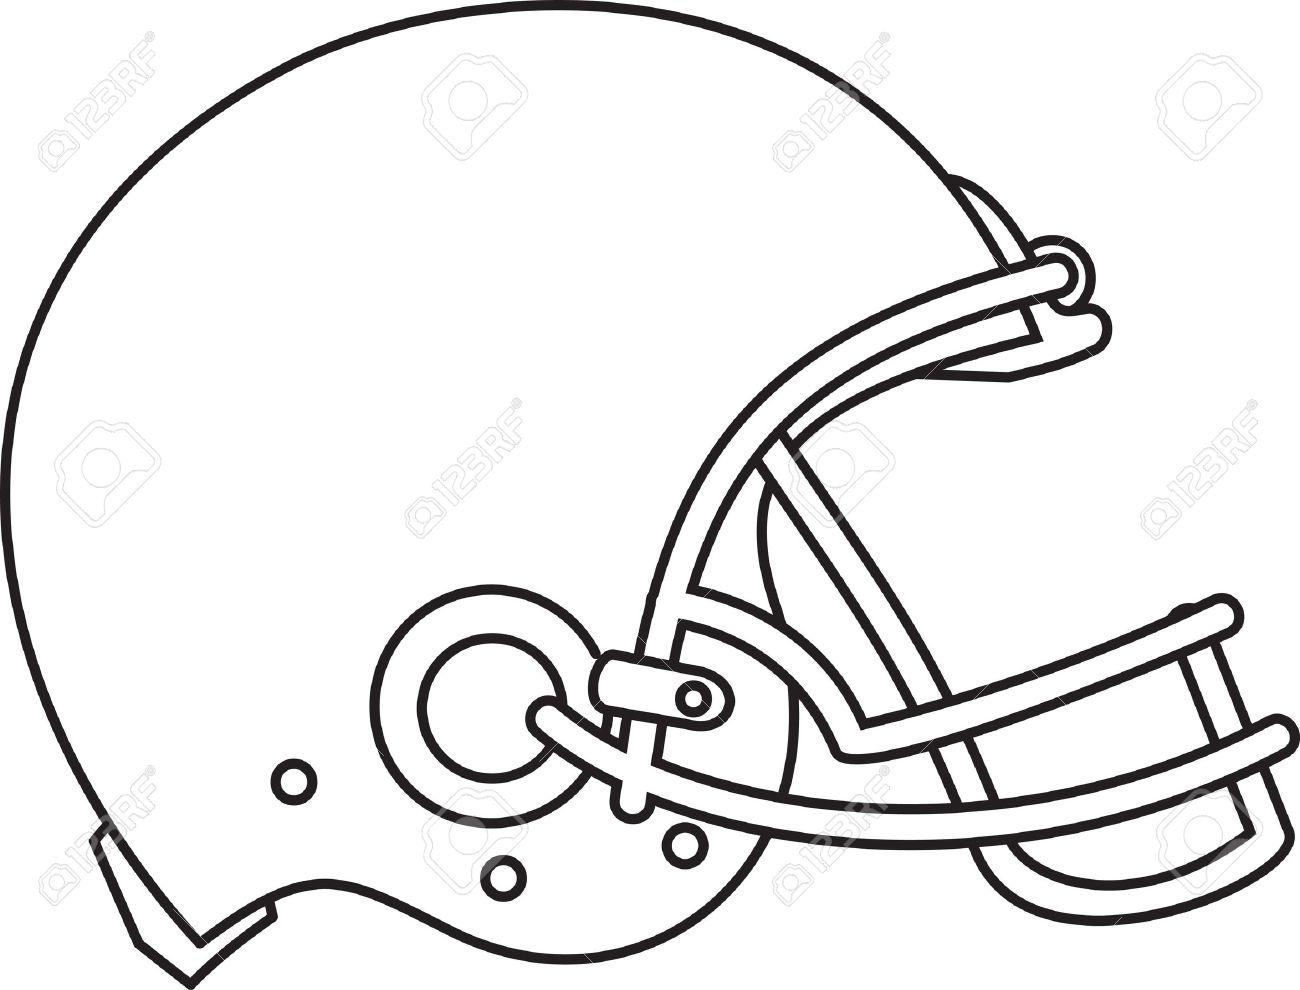 line drawing illustration of an american football helmet viewed rh 123rf com